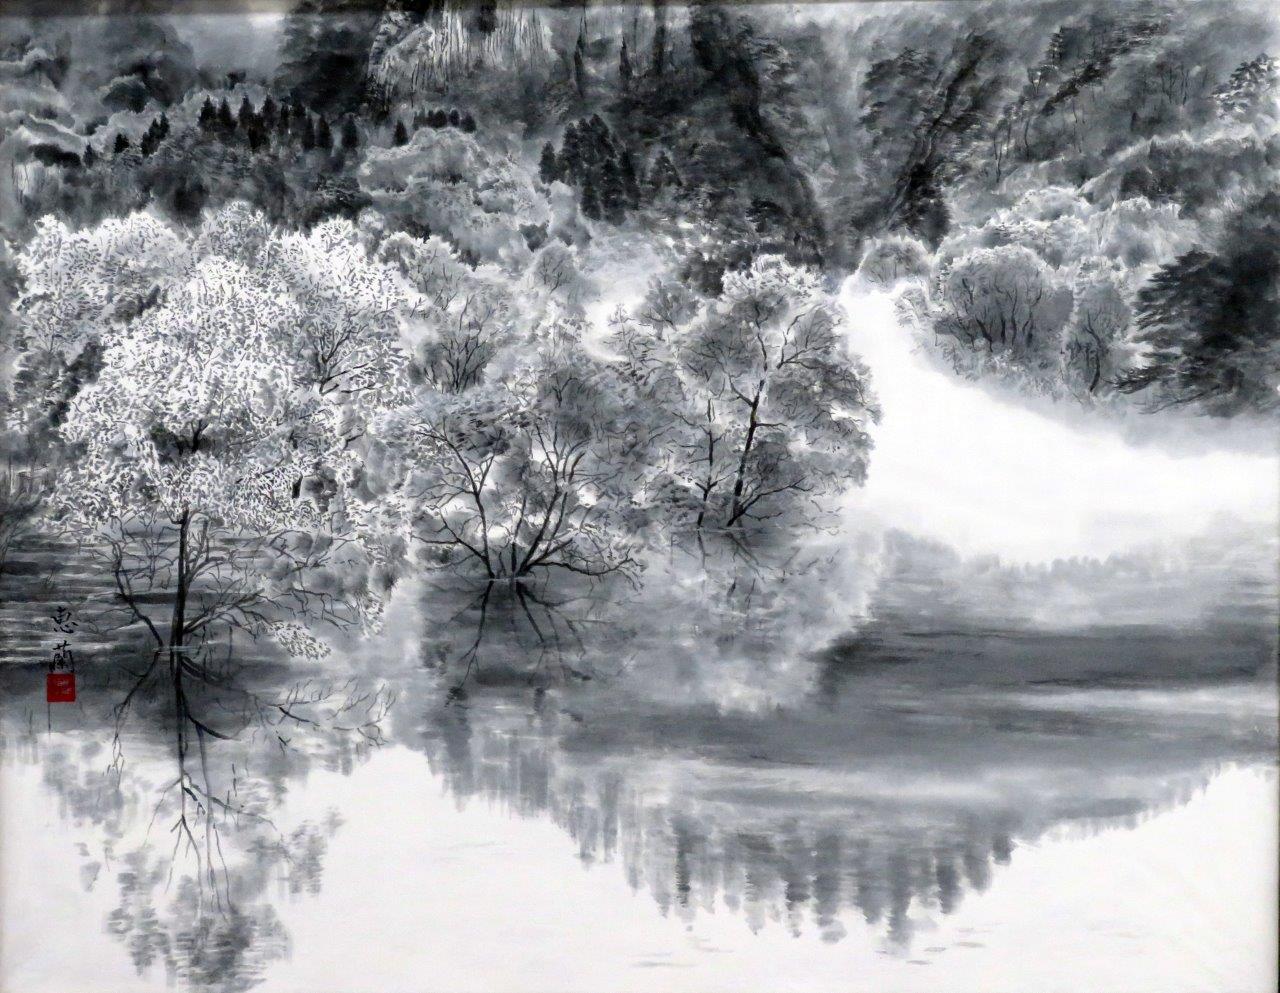 木暮恵蘭 朝の山湖 (2)